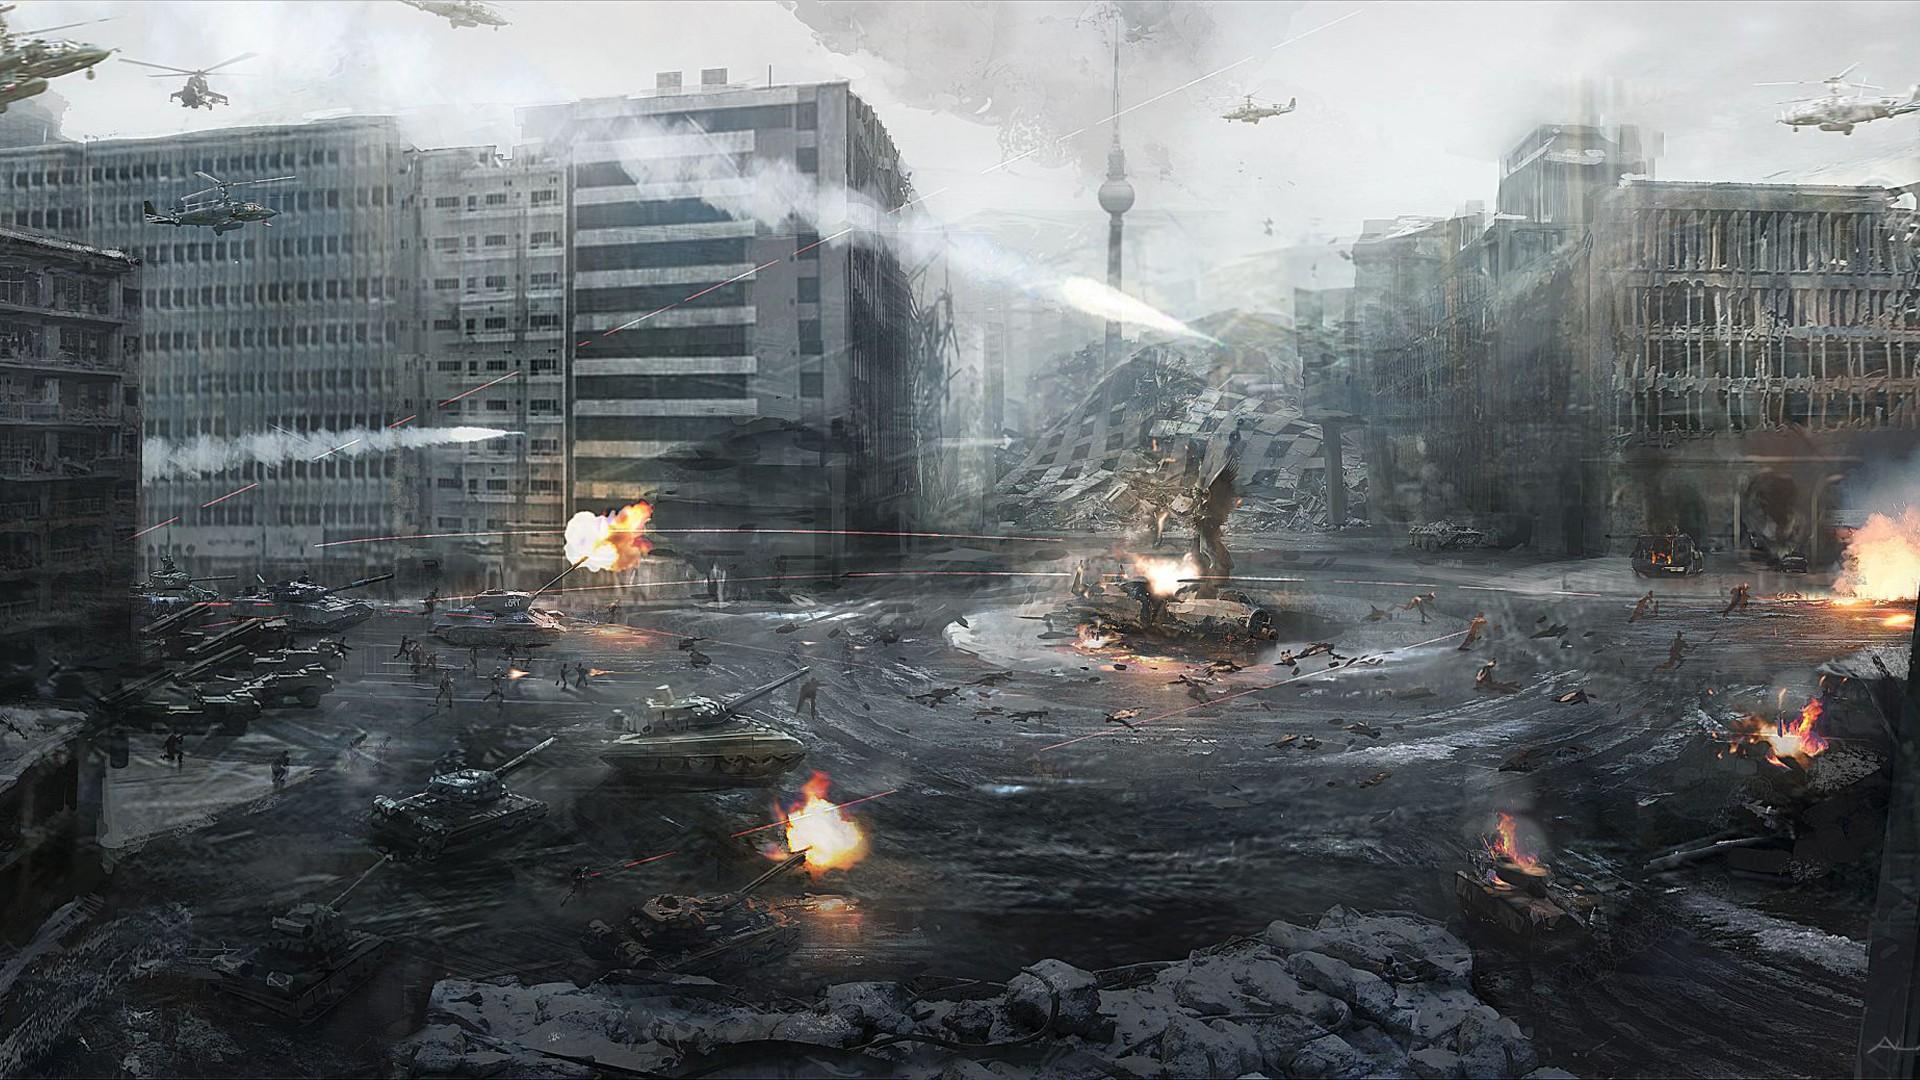 battle of berlin wallpaper - photo #17